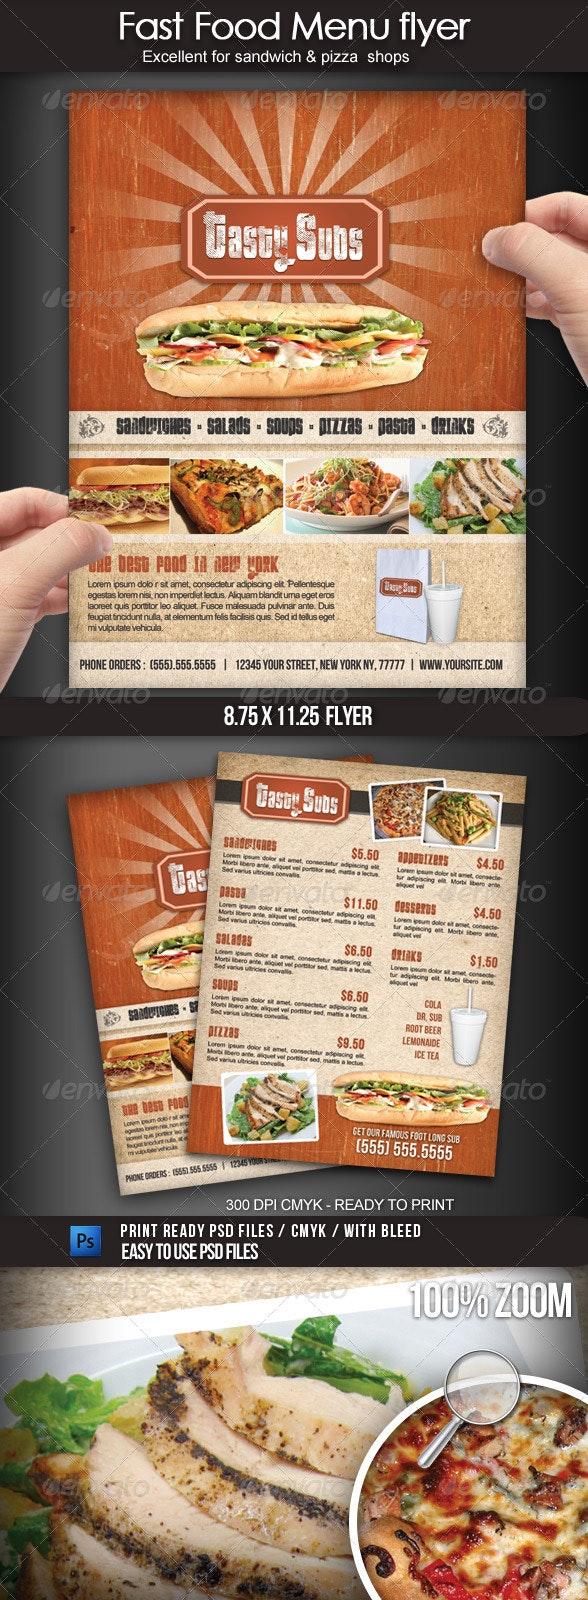 Fast Food Menu Flyer - Food Menus Print Templates